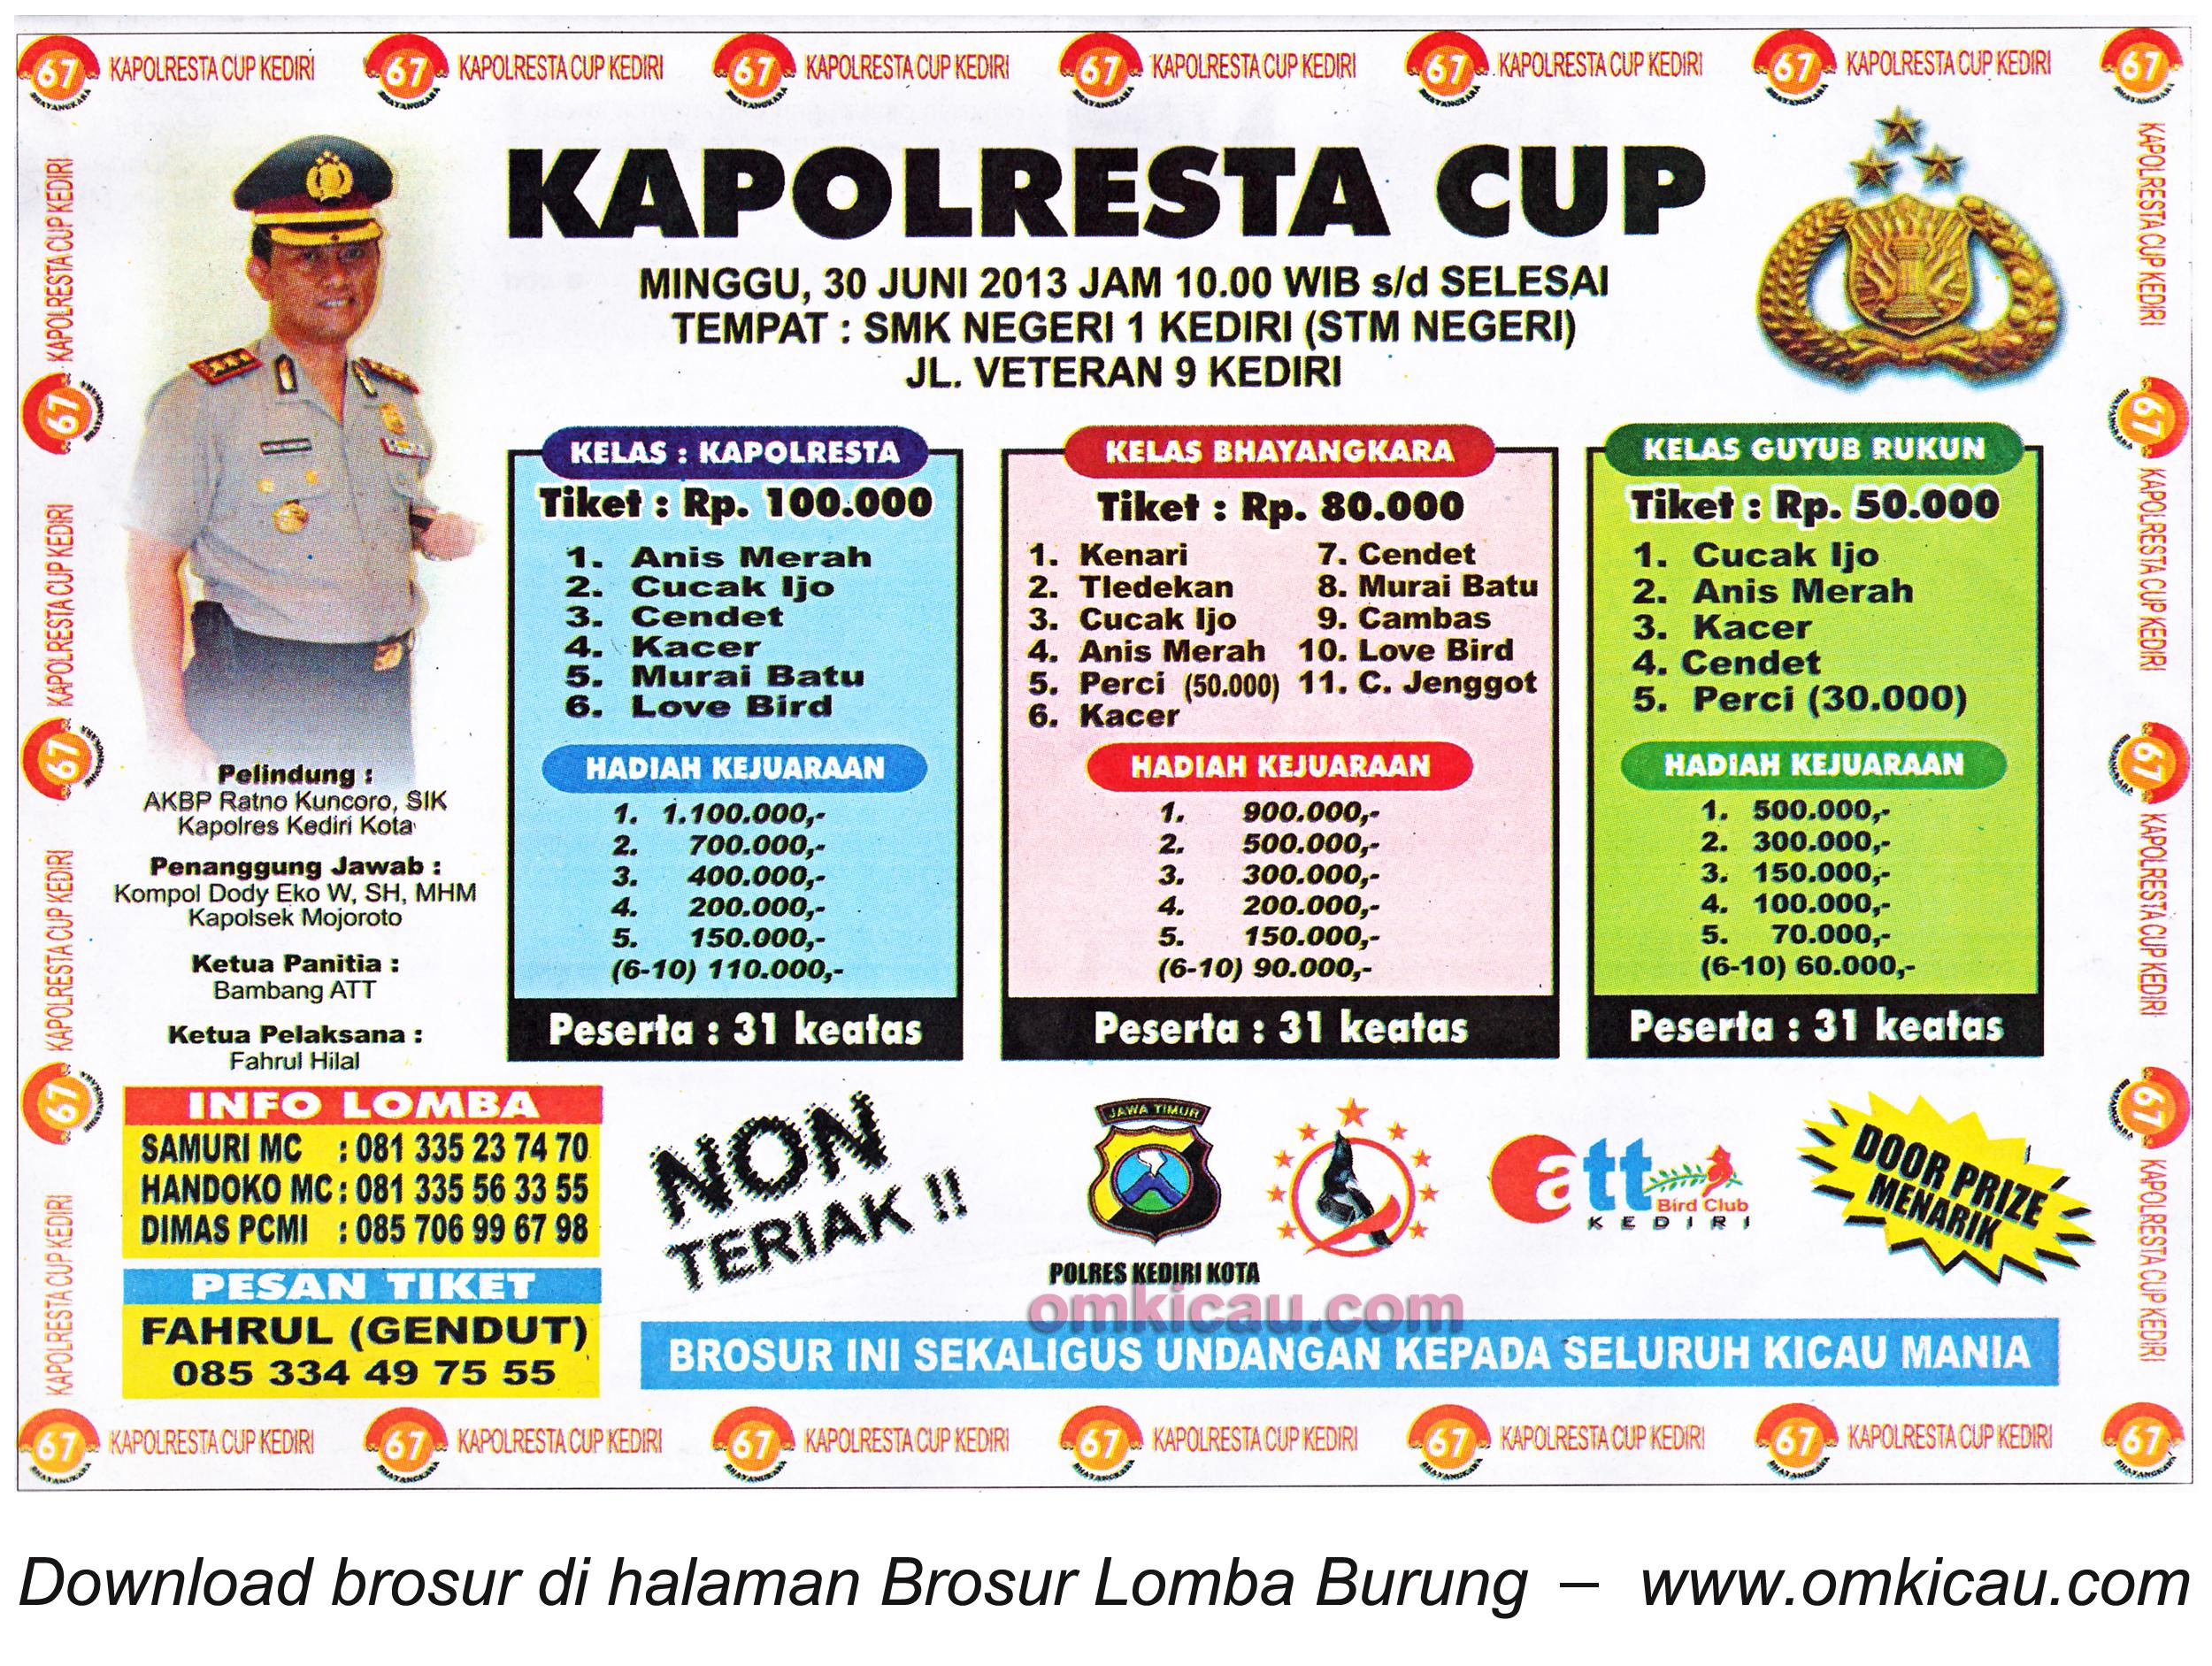 Brosur Lomba Kapolresta Cup Kediri 30 Juni 2013